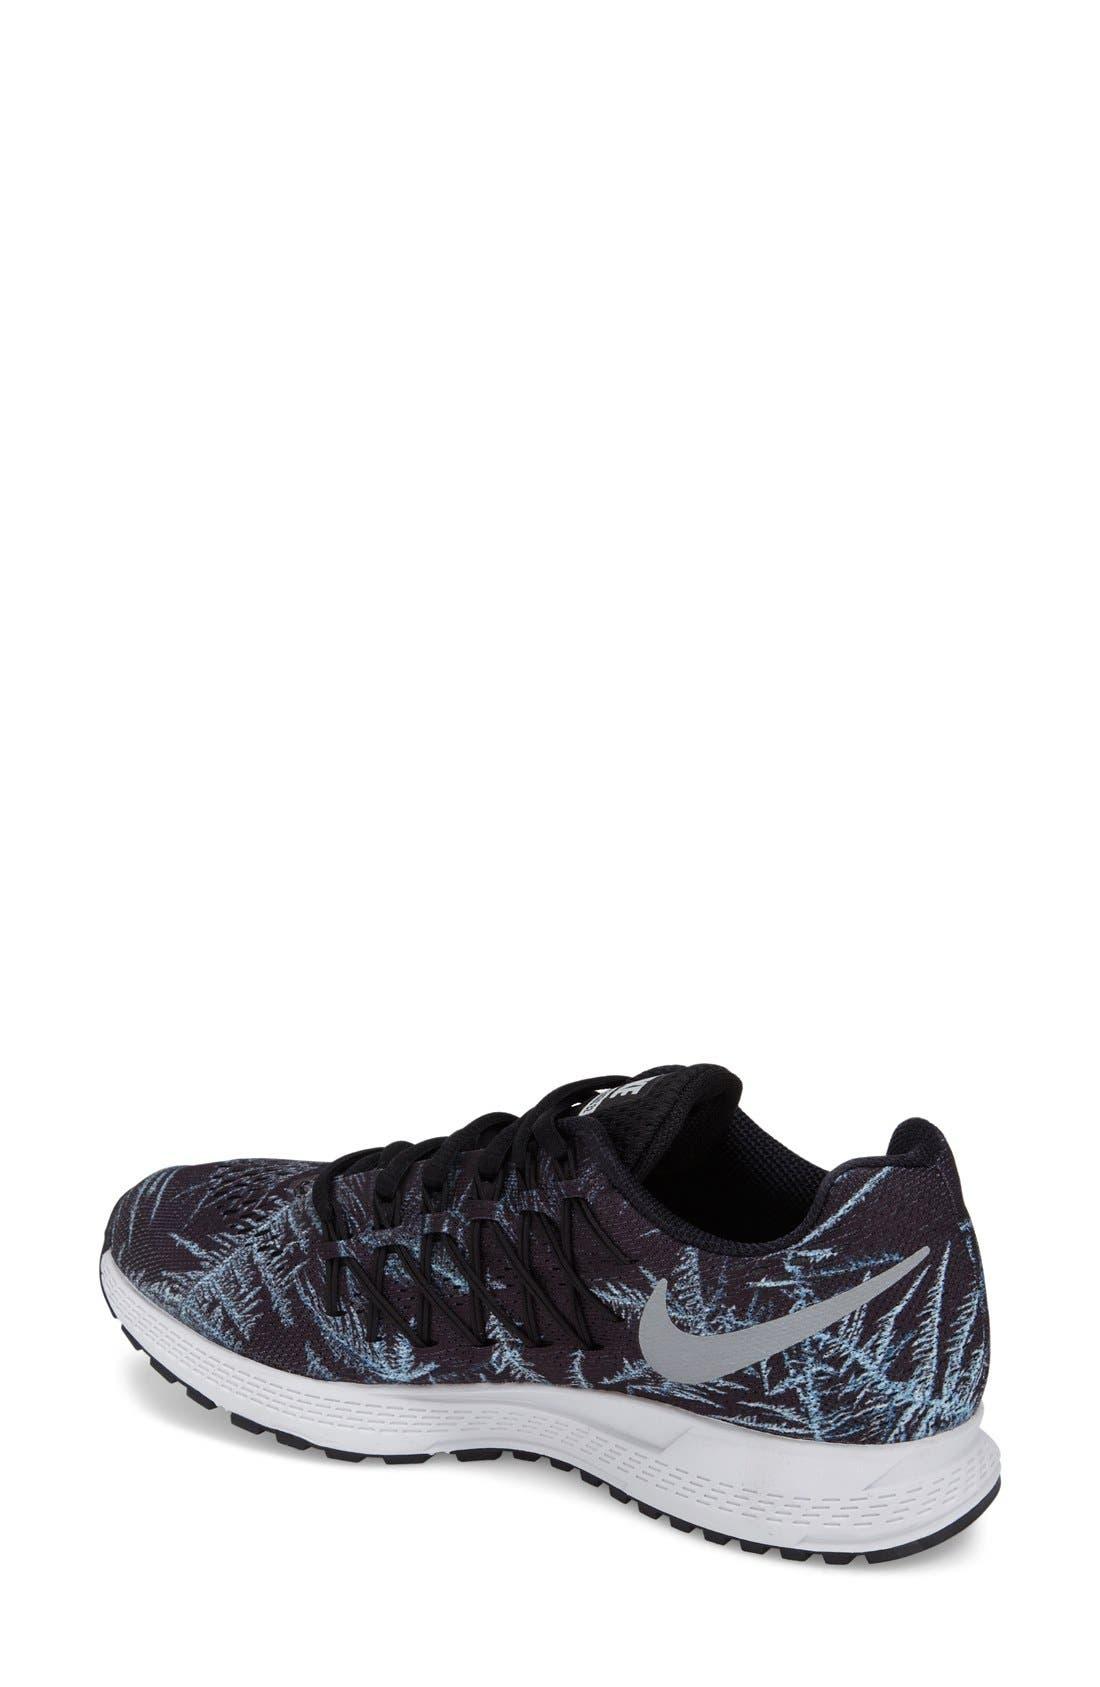 Alternate Image 2  - Nike 'Air Zoom Pegasus 32 Solstice' Running Shoe (Women)